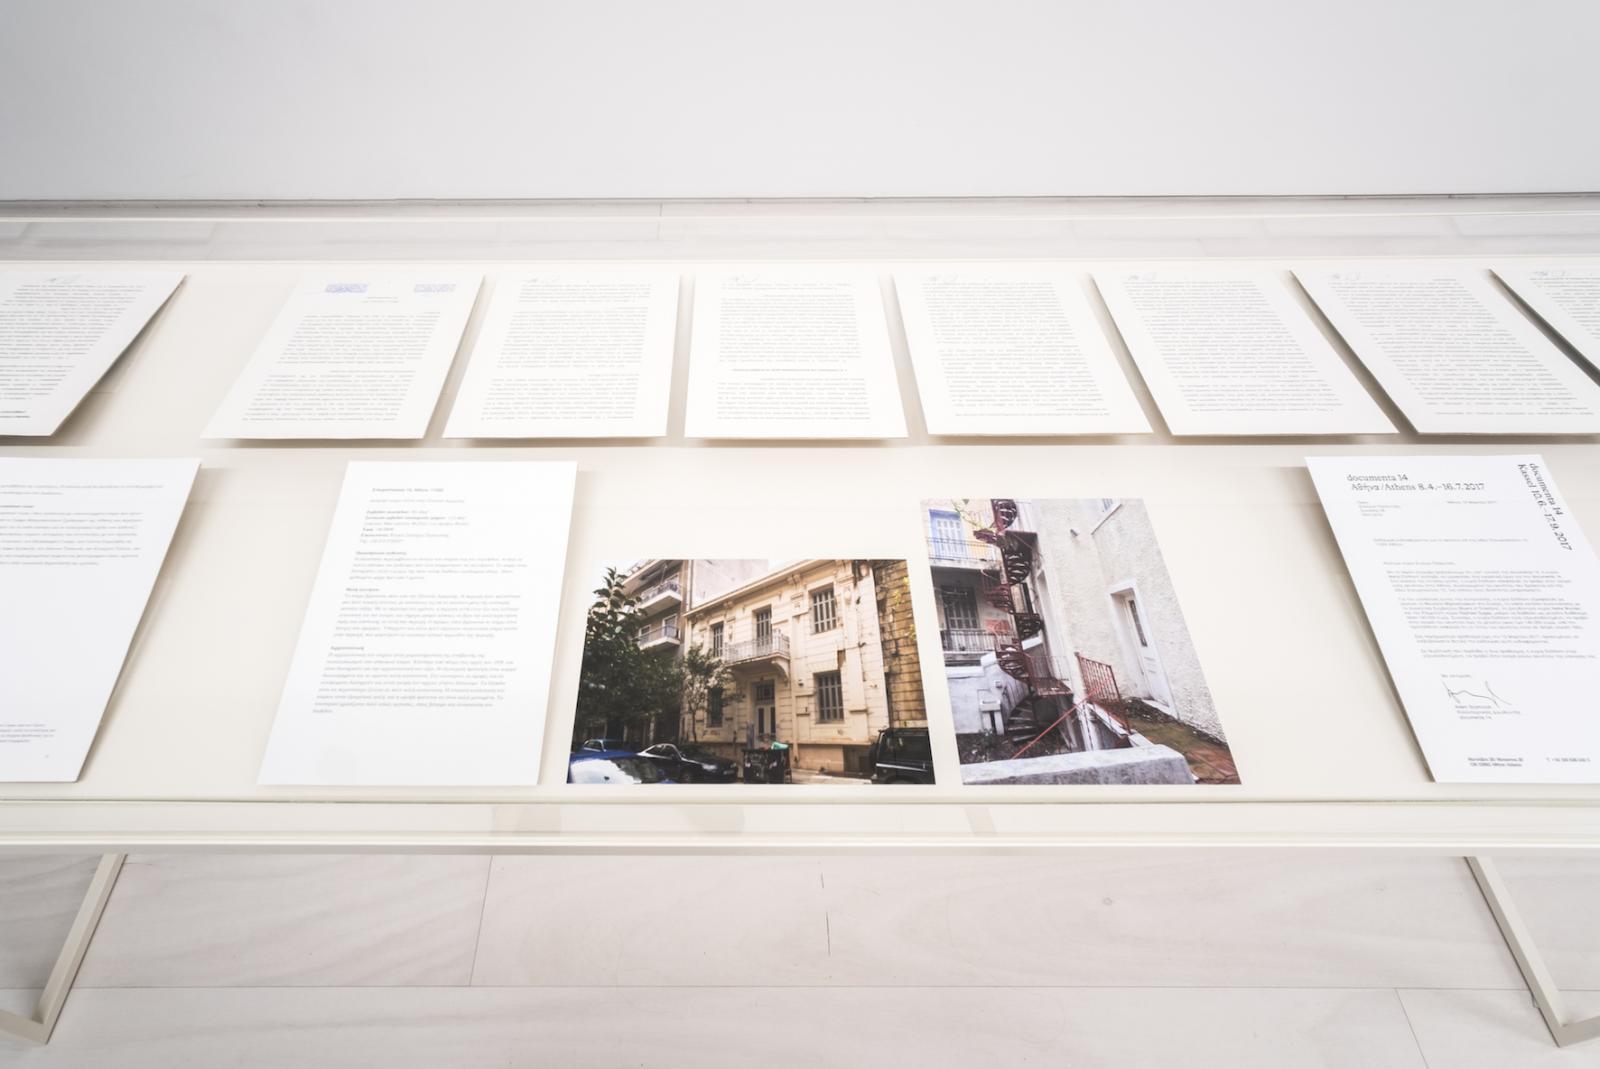 Maria Eichhorn /Building as unowned property/(2017) Photo: Mathias Völzke